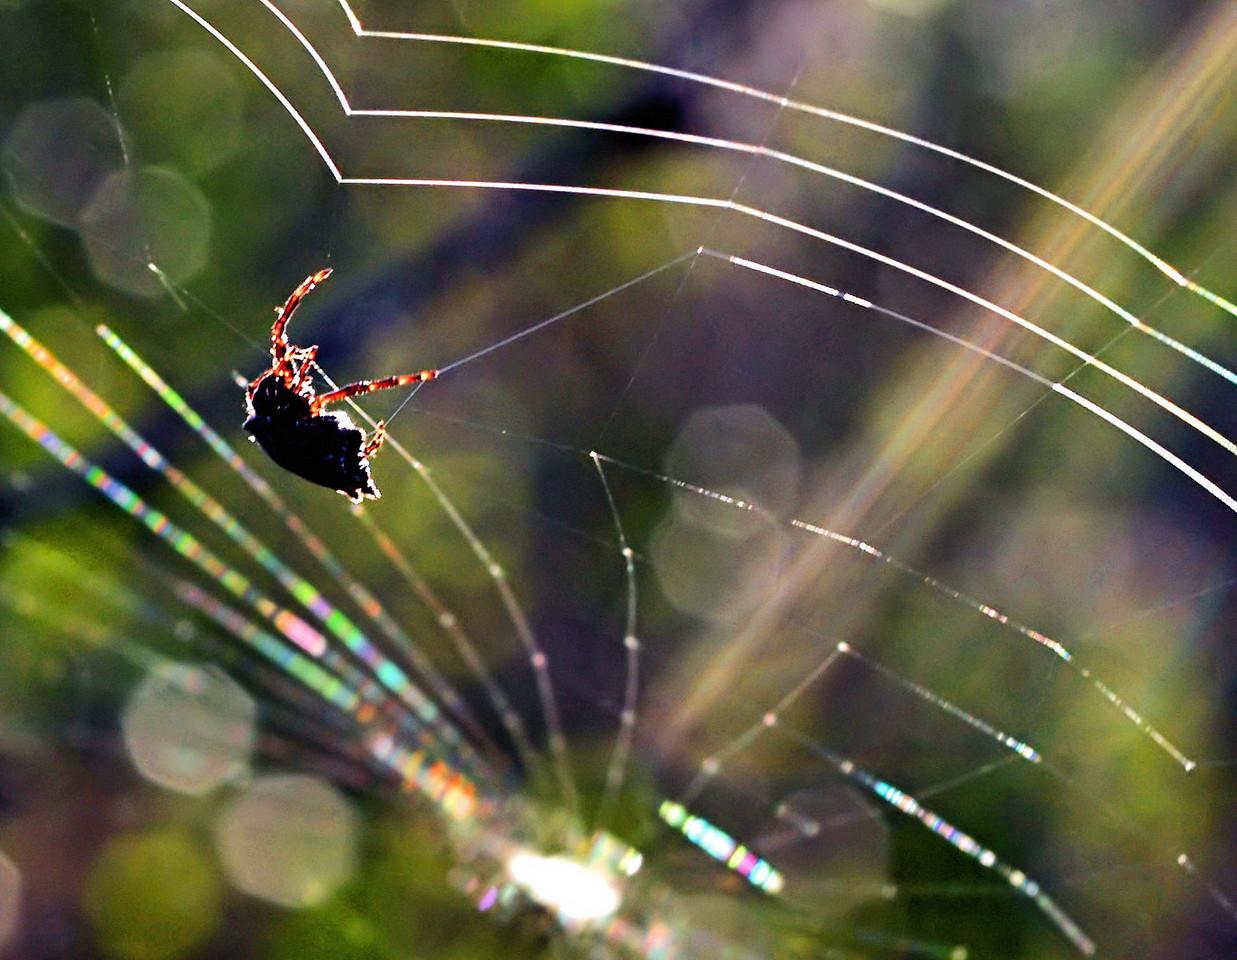 OLYMPUS DIGITAL CAMERA--Great shot of spider repairing and crosslinking the web.